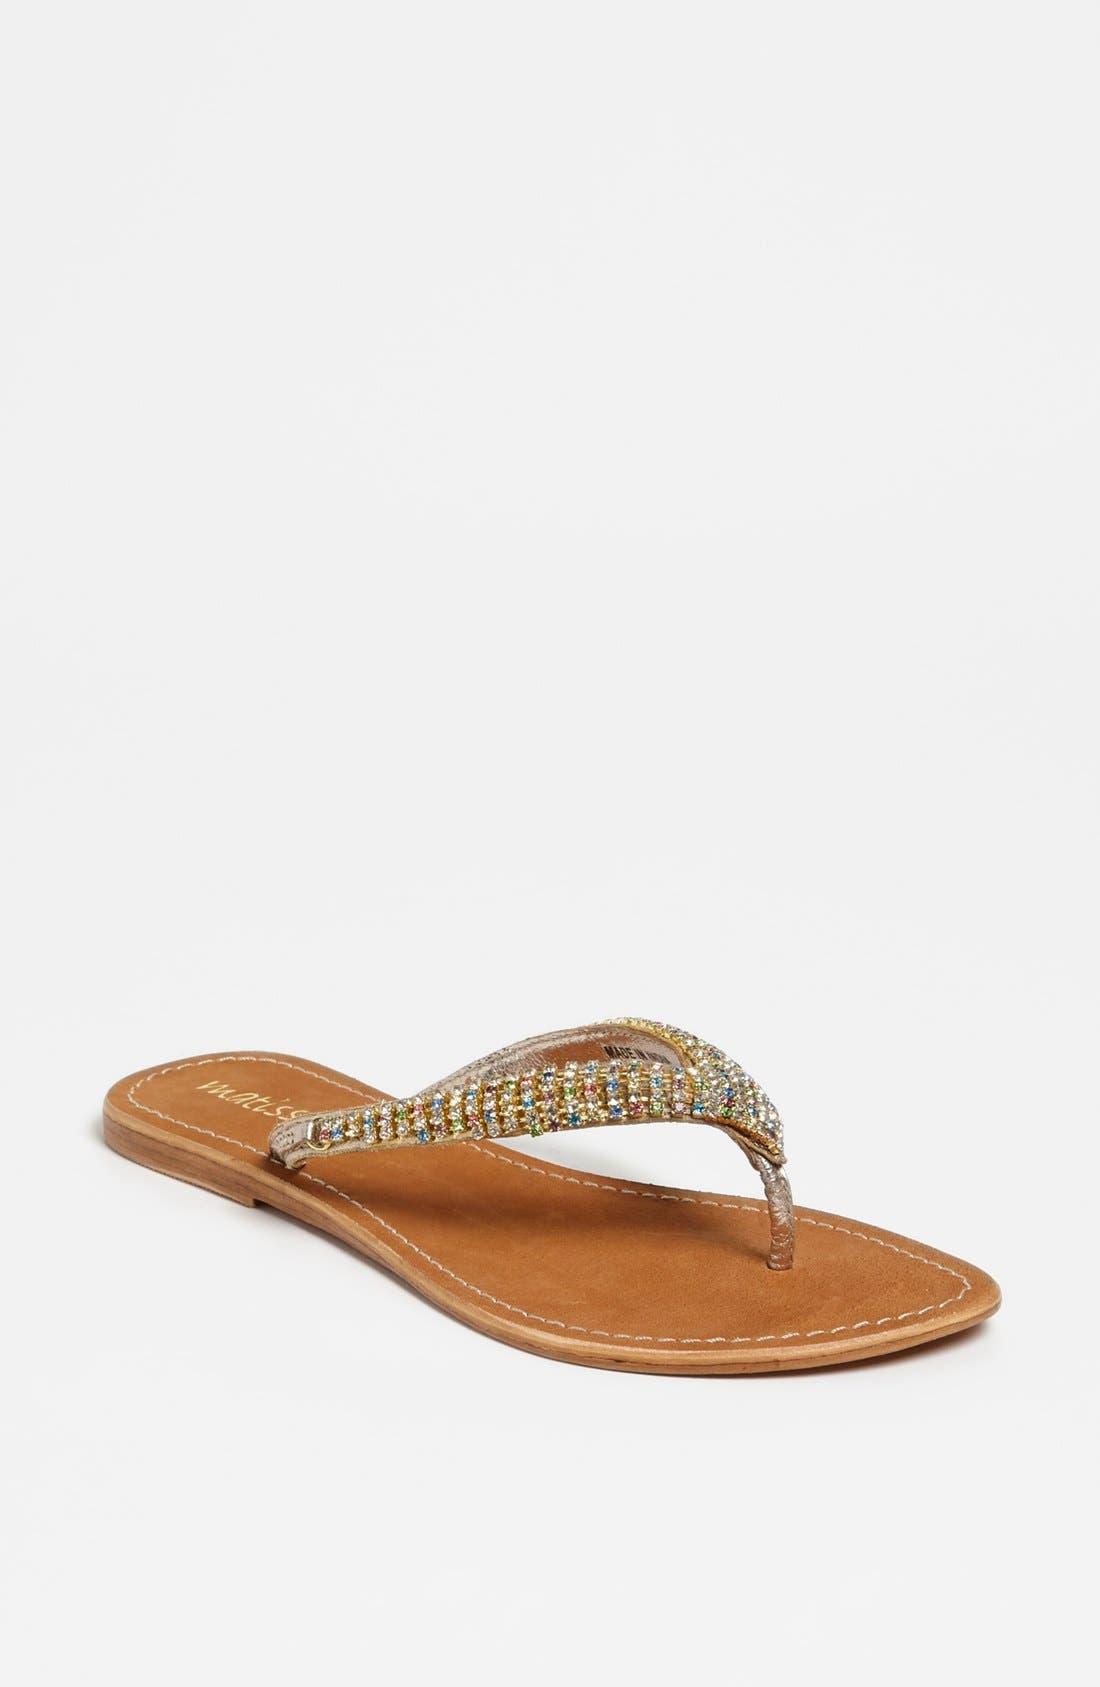 Alternate Image 1 Selected - Matisse 'Universe' Sandal